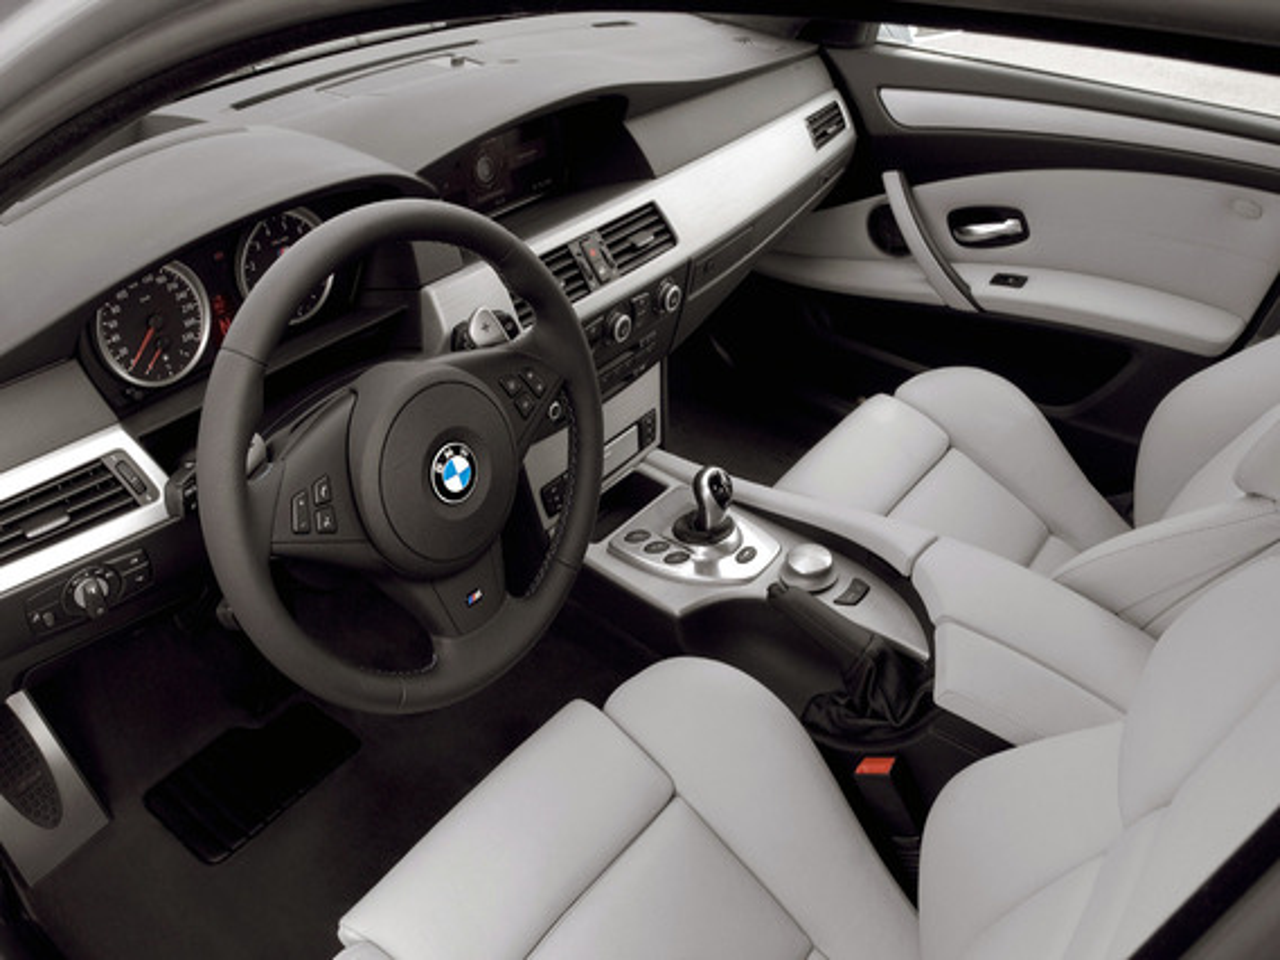 Можно ли установить доводчики на двери BMW 5 E60